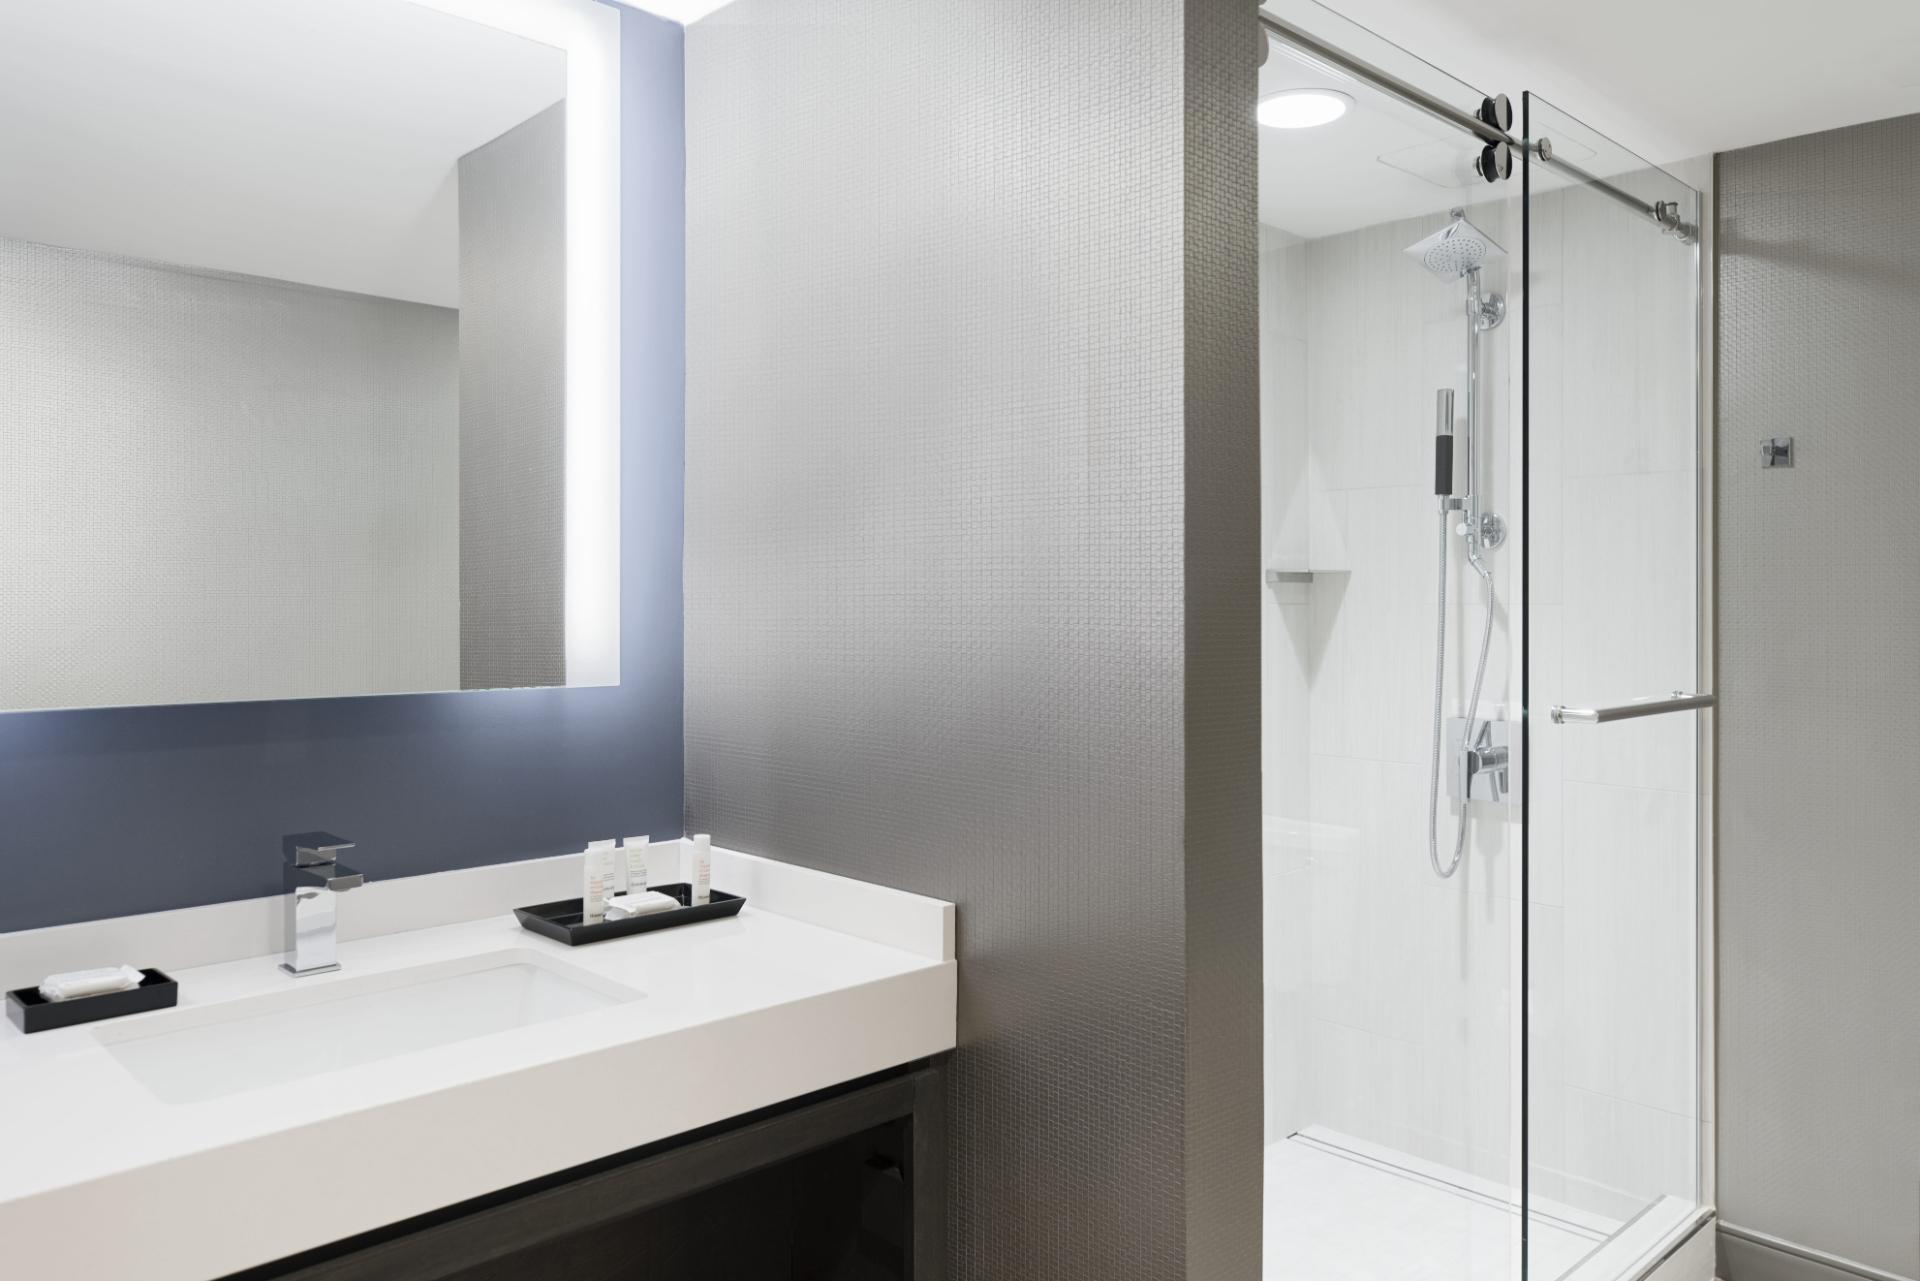 Presidential suite bathroom at Crystal City Marriott